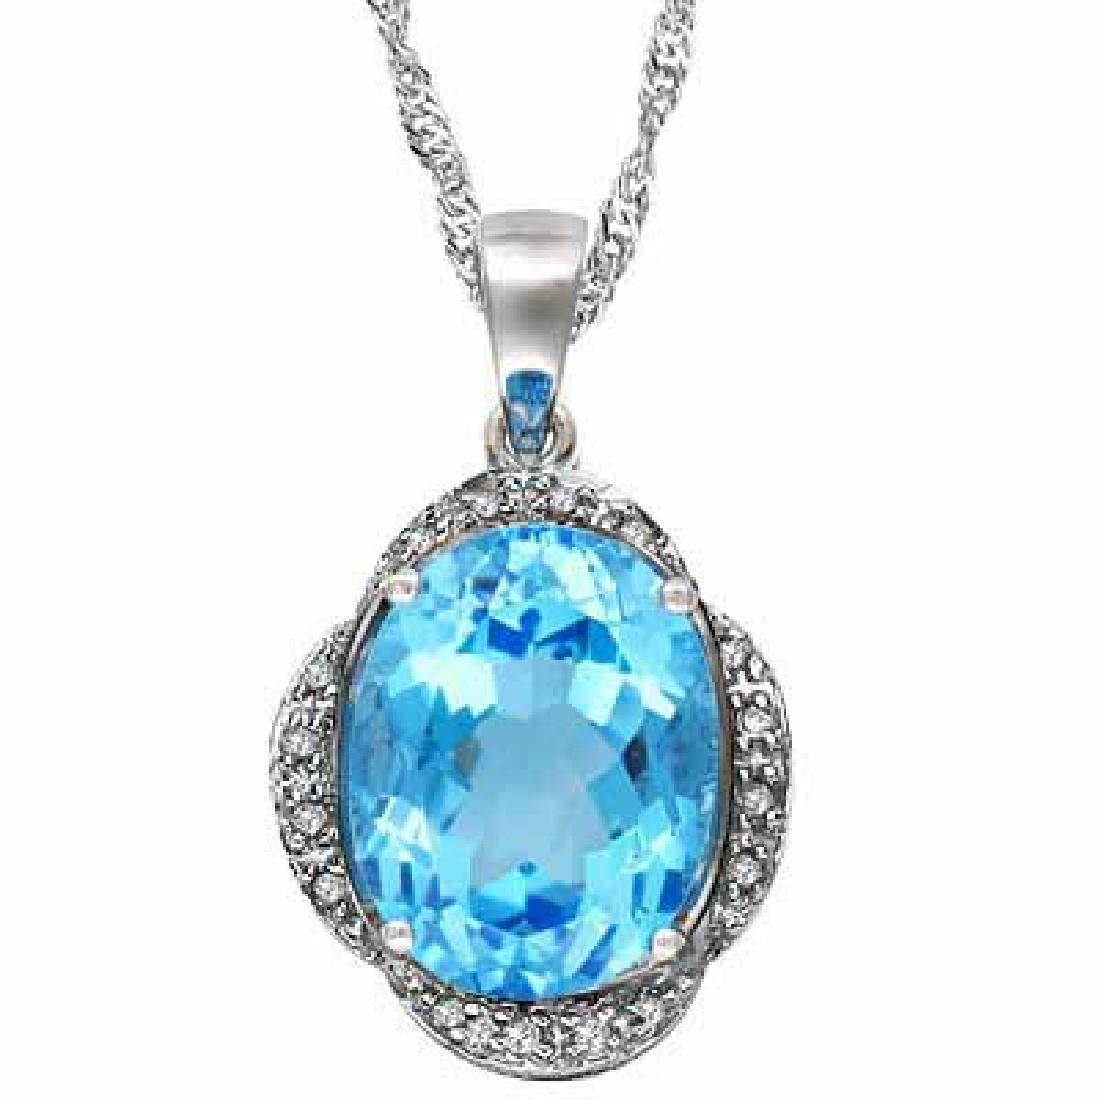 5 1/4 CARAT BABY SWISS BLUE TOPAZ & DIAMOND 925 STERLIN